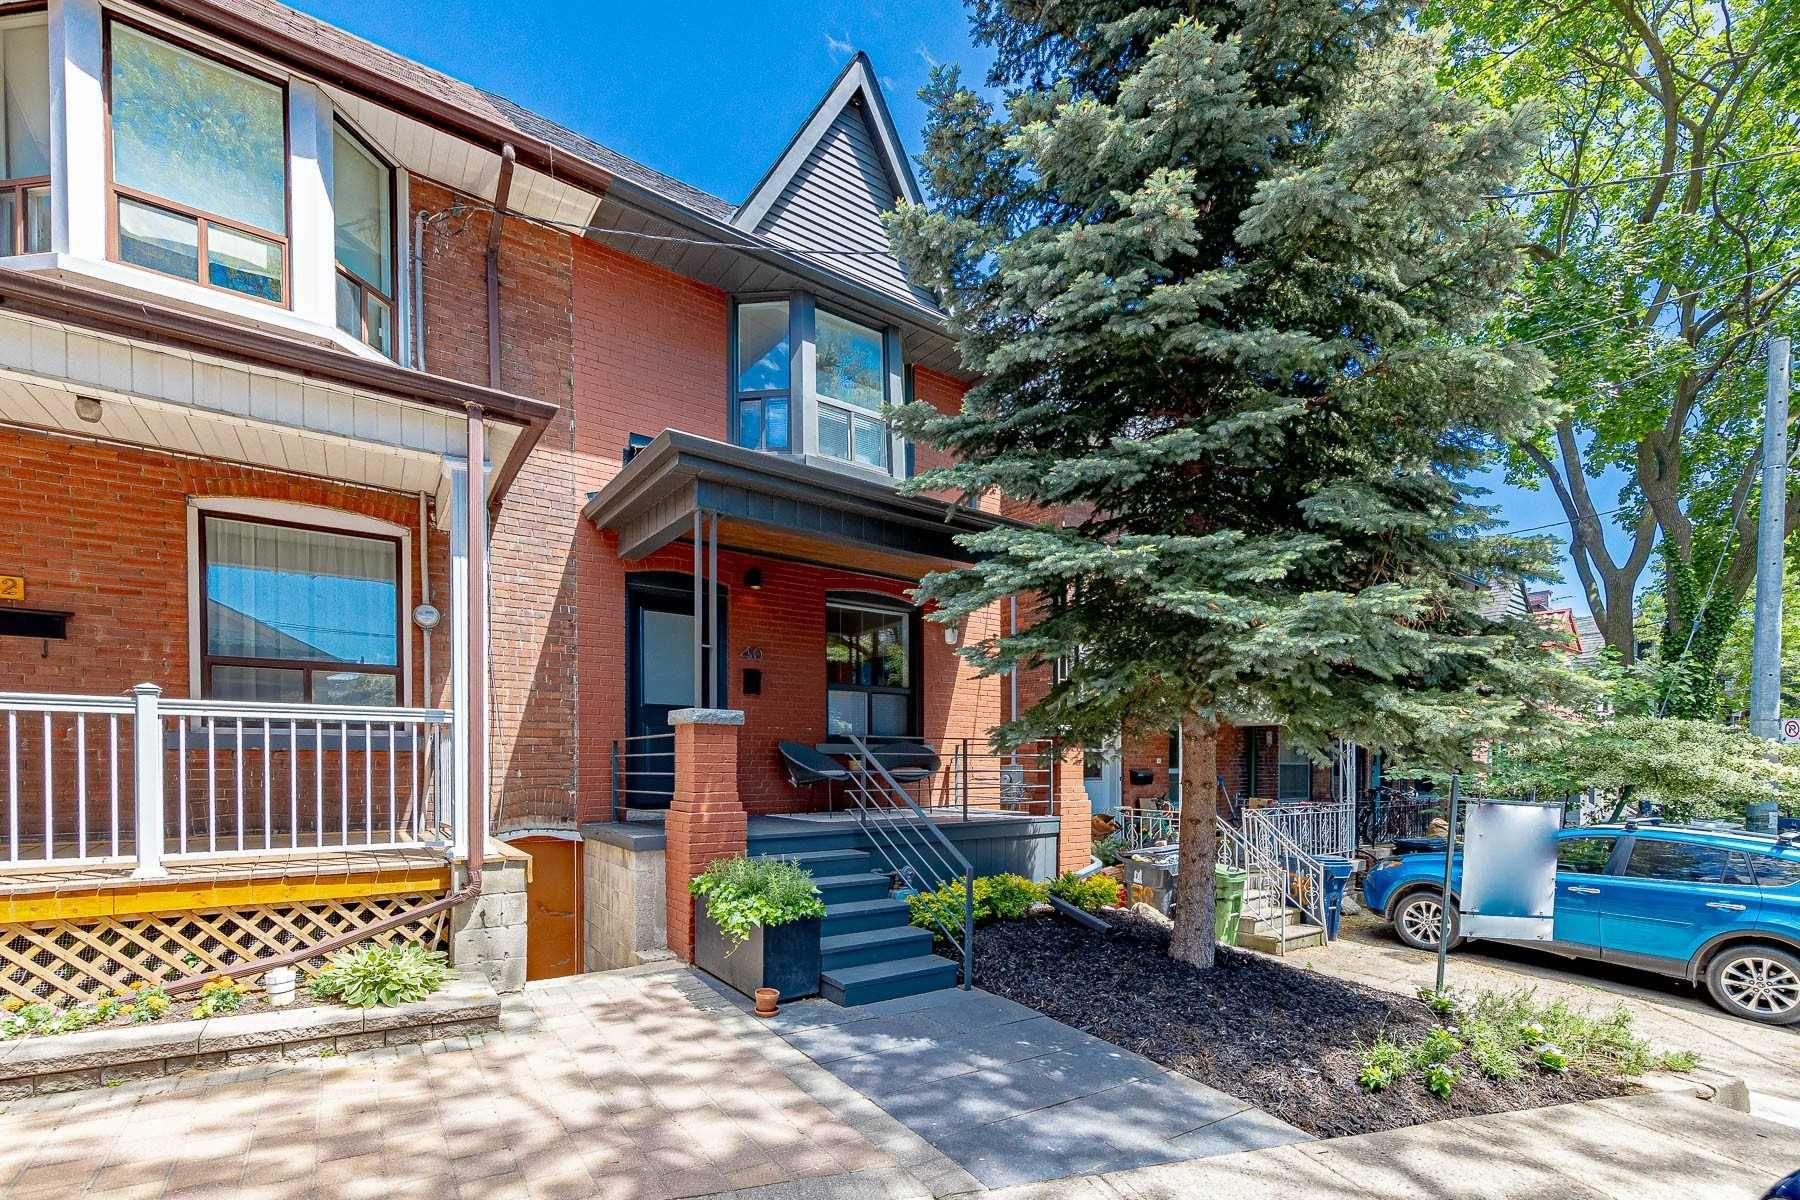 Main Photo: 40 Mackenzie Crescent in Toronto: Little Portugal House (2-Storey) for sale (Toronto C01)  : MLS®# C5275307